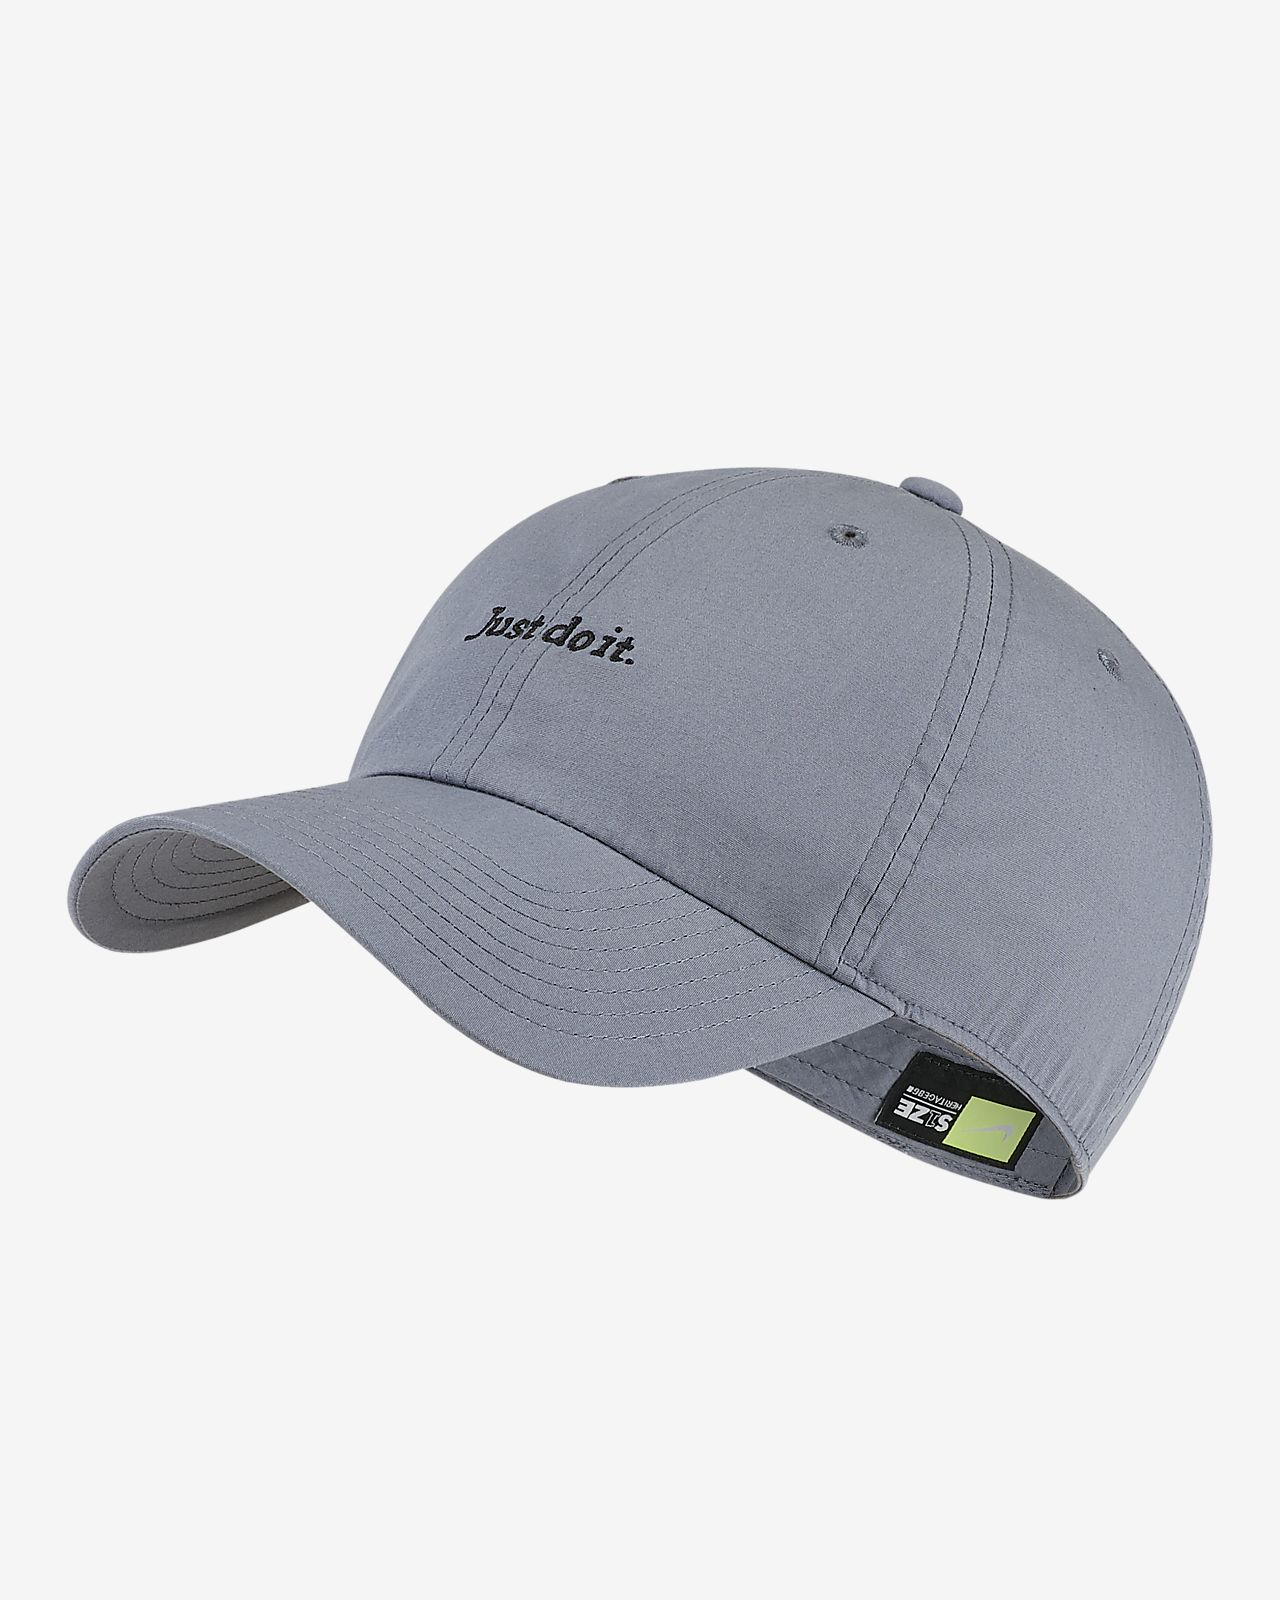 Nike Sportswear Heritage86 JDI Adjustable Hat